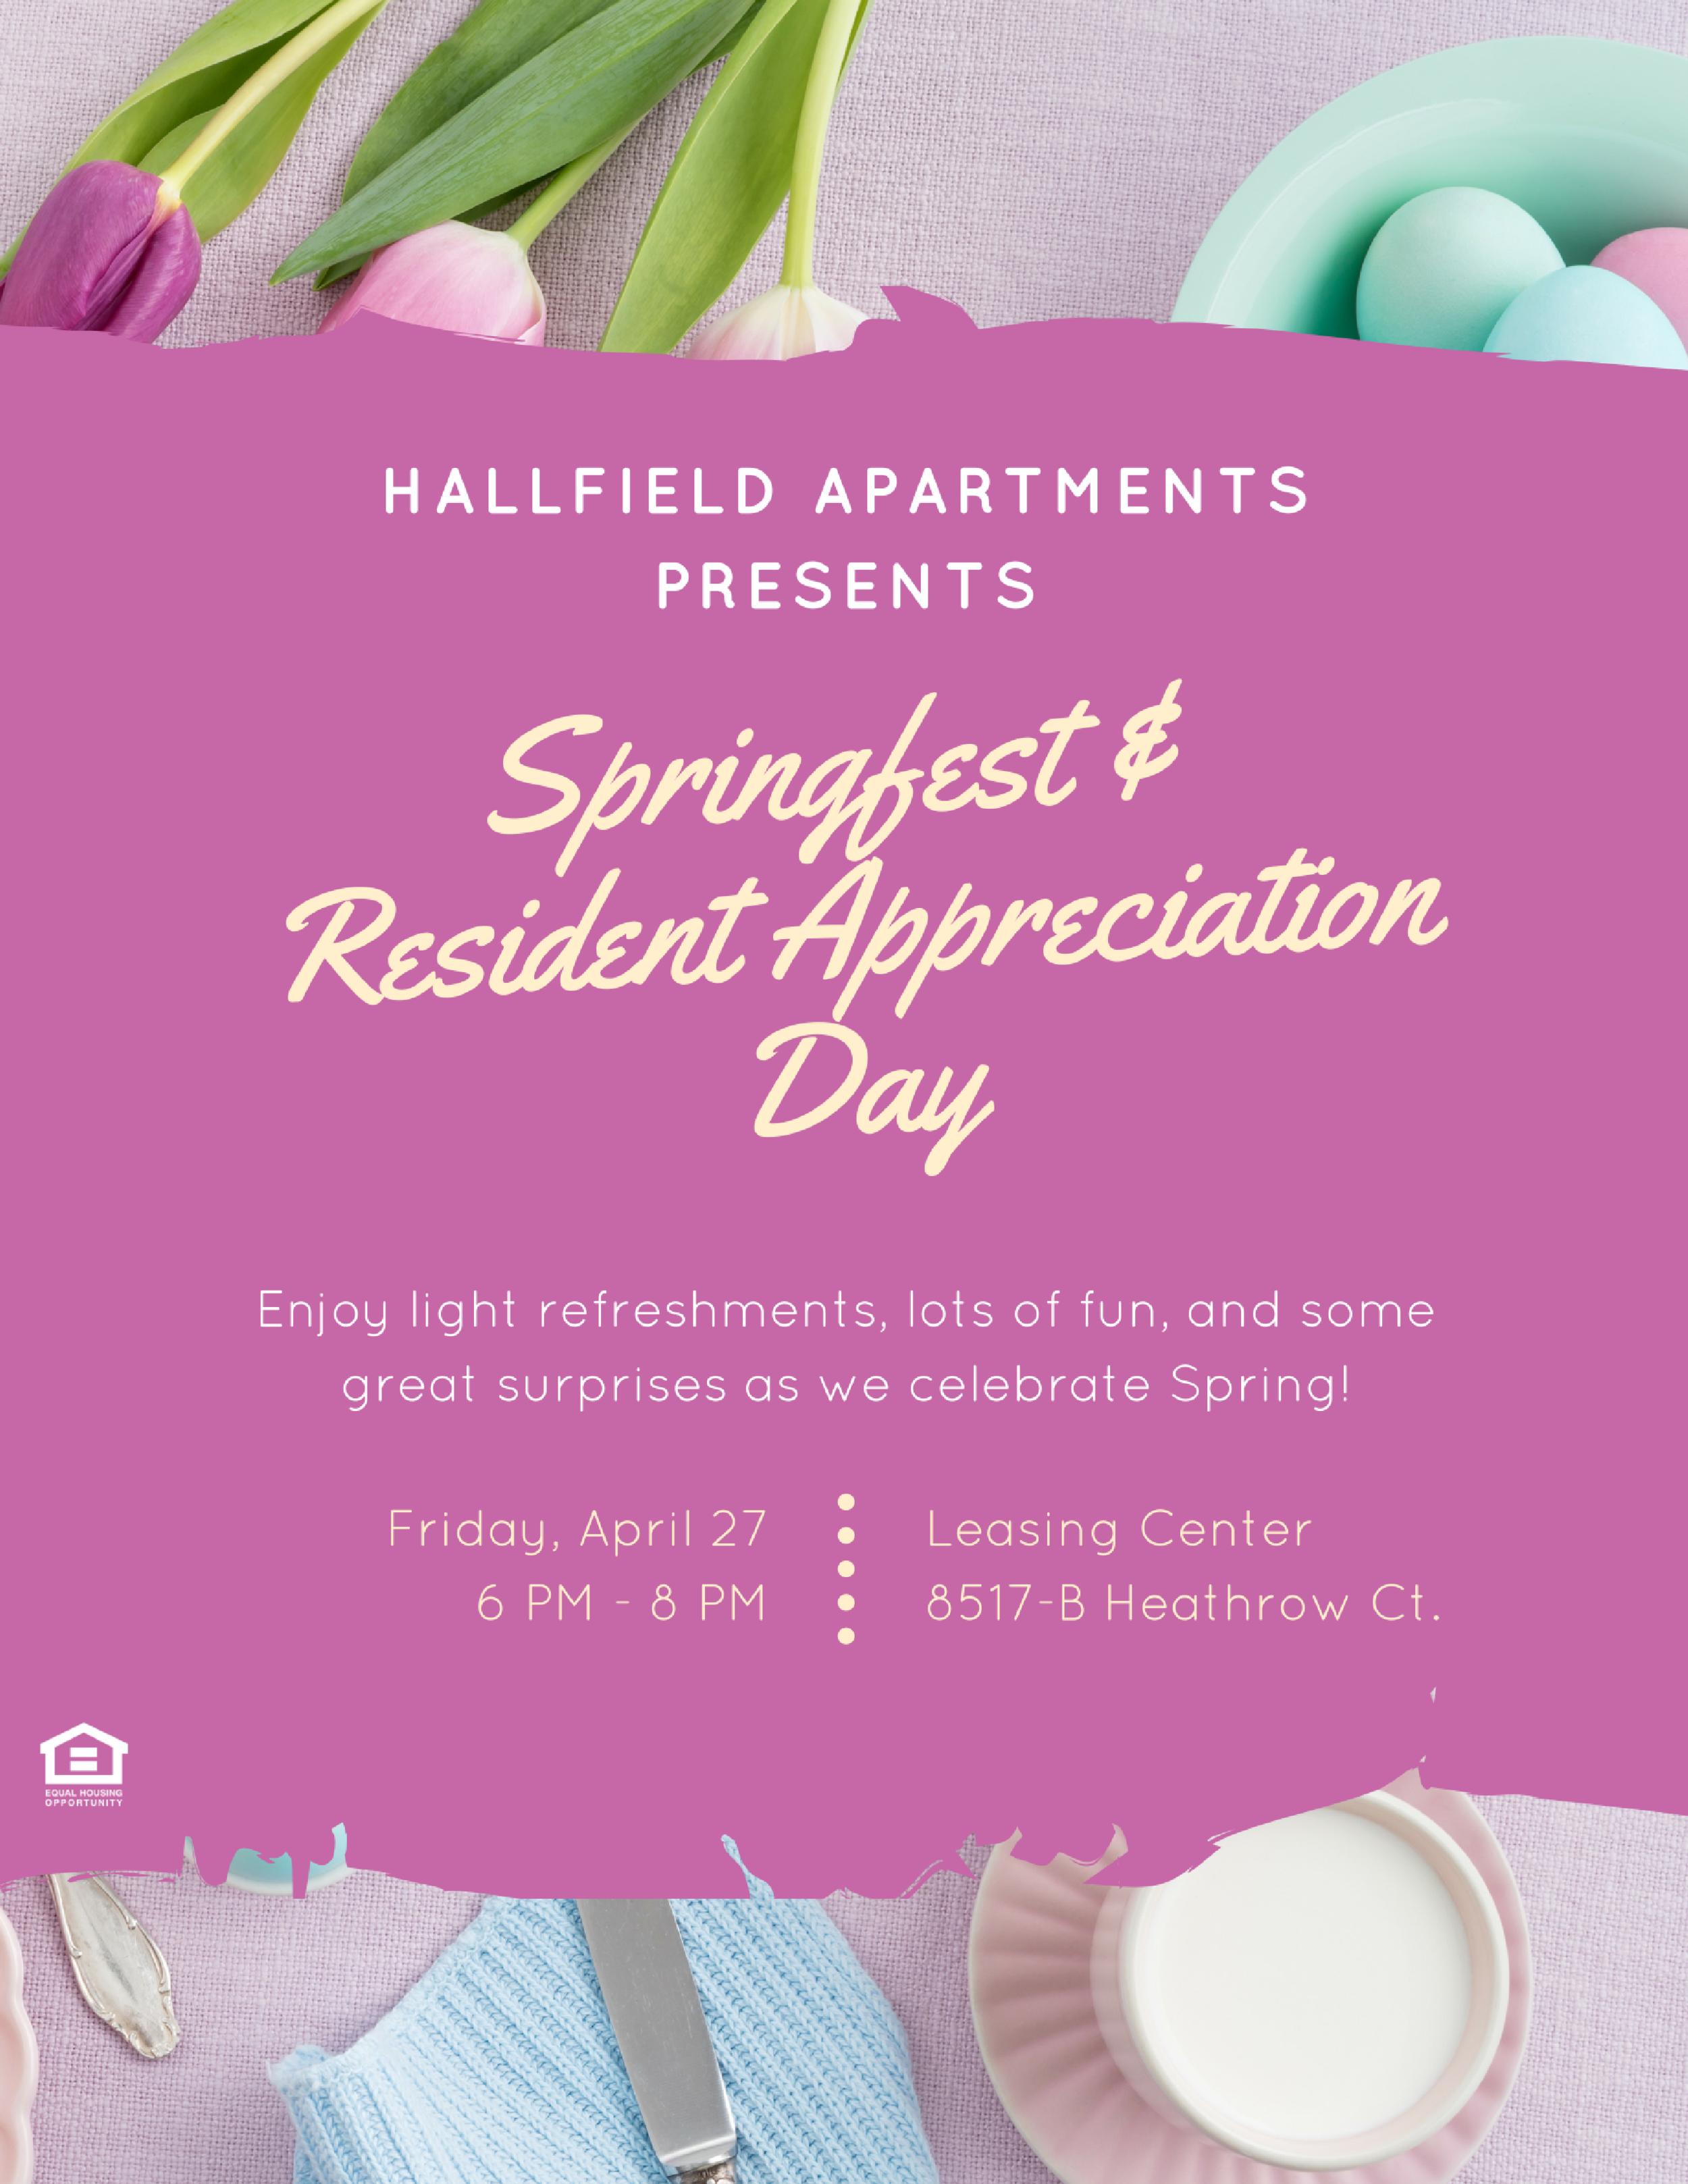 Hallfield Apartments Springfest & Resident Appreciation